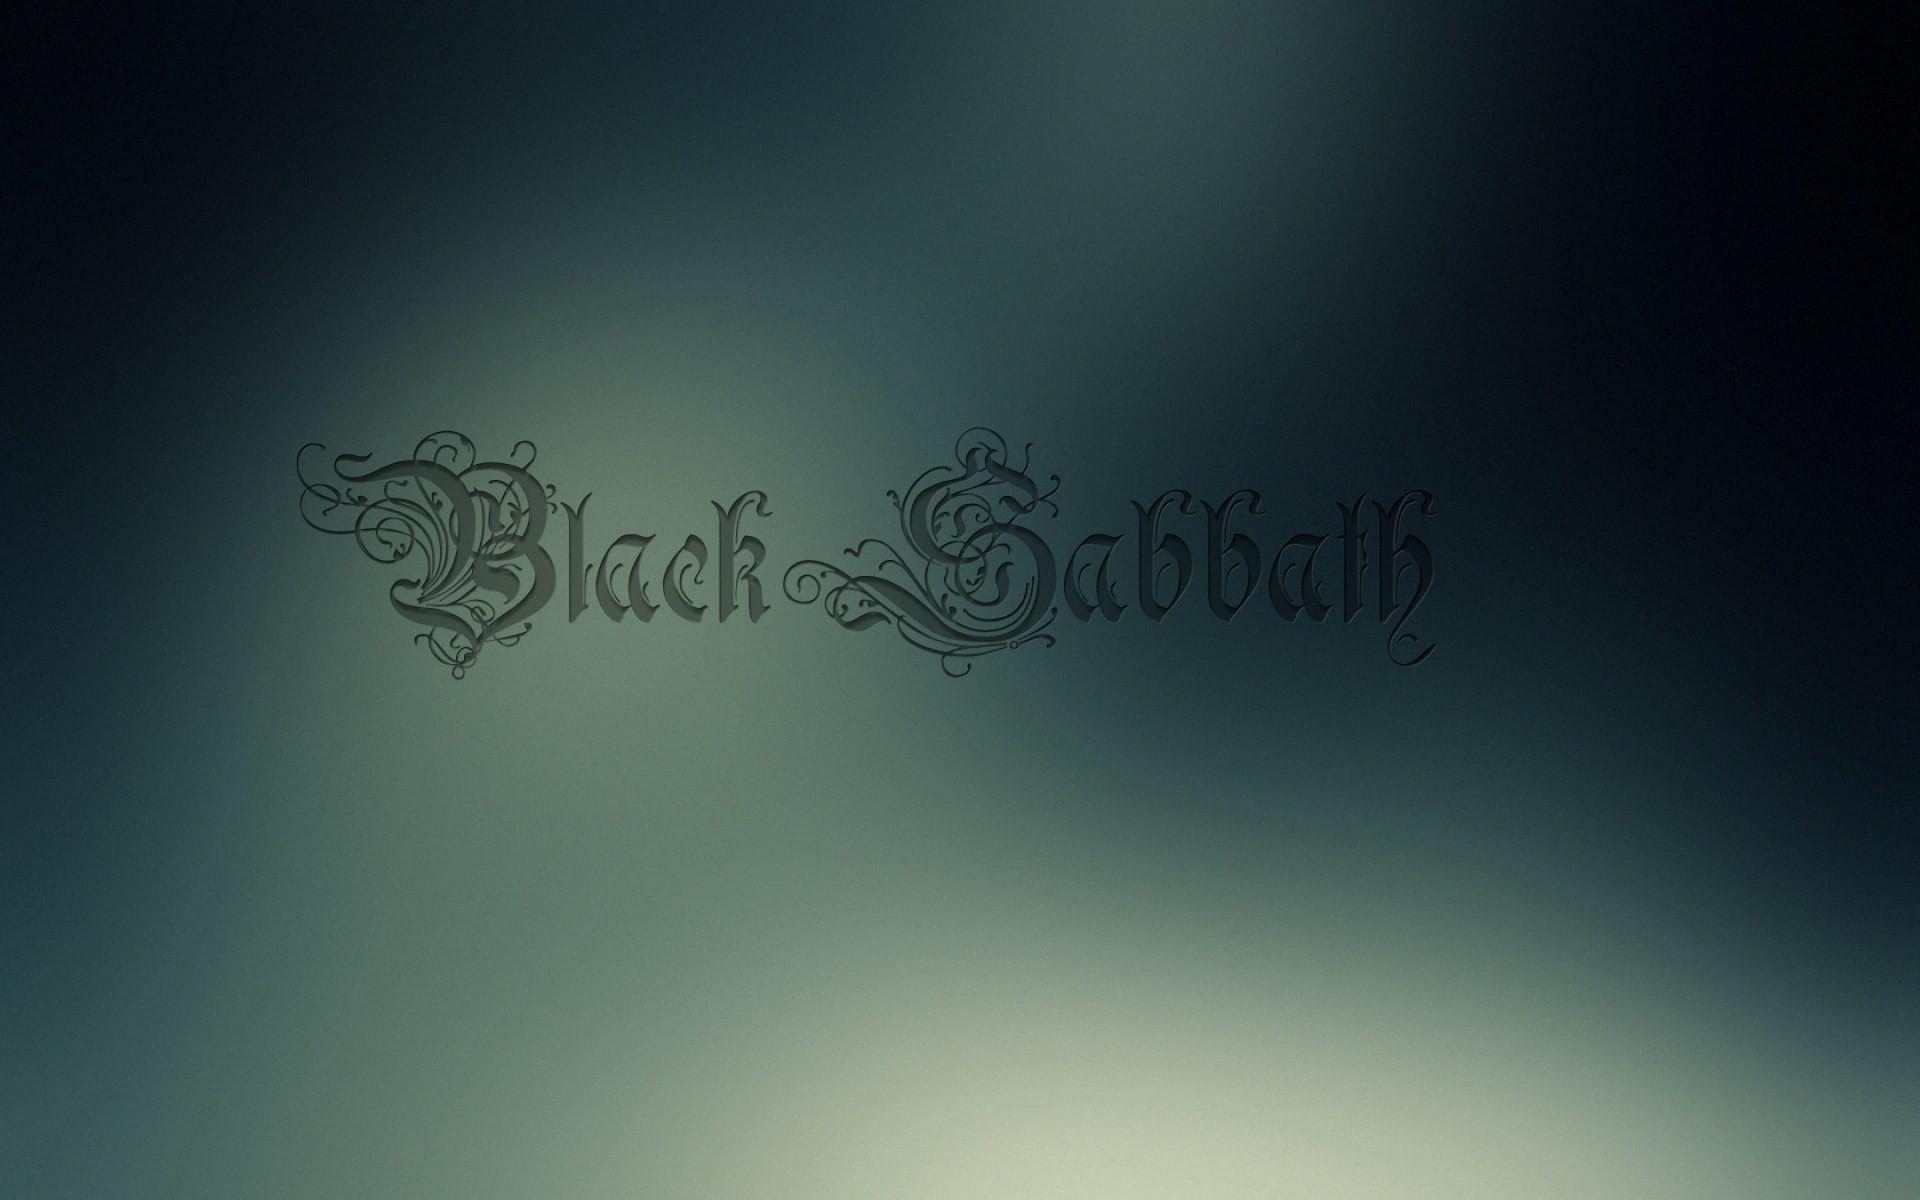 black sabbath free hd widescreen 1920×1200